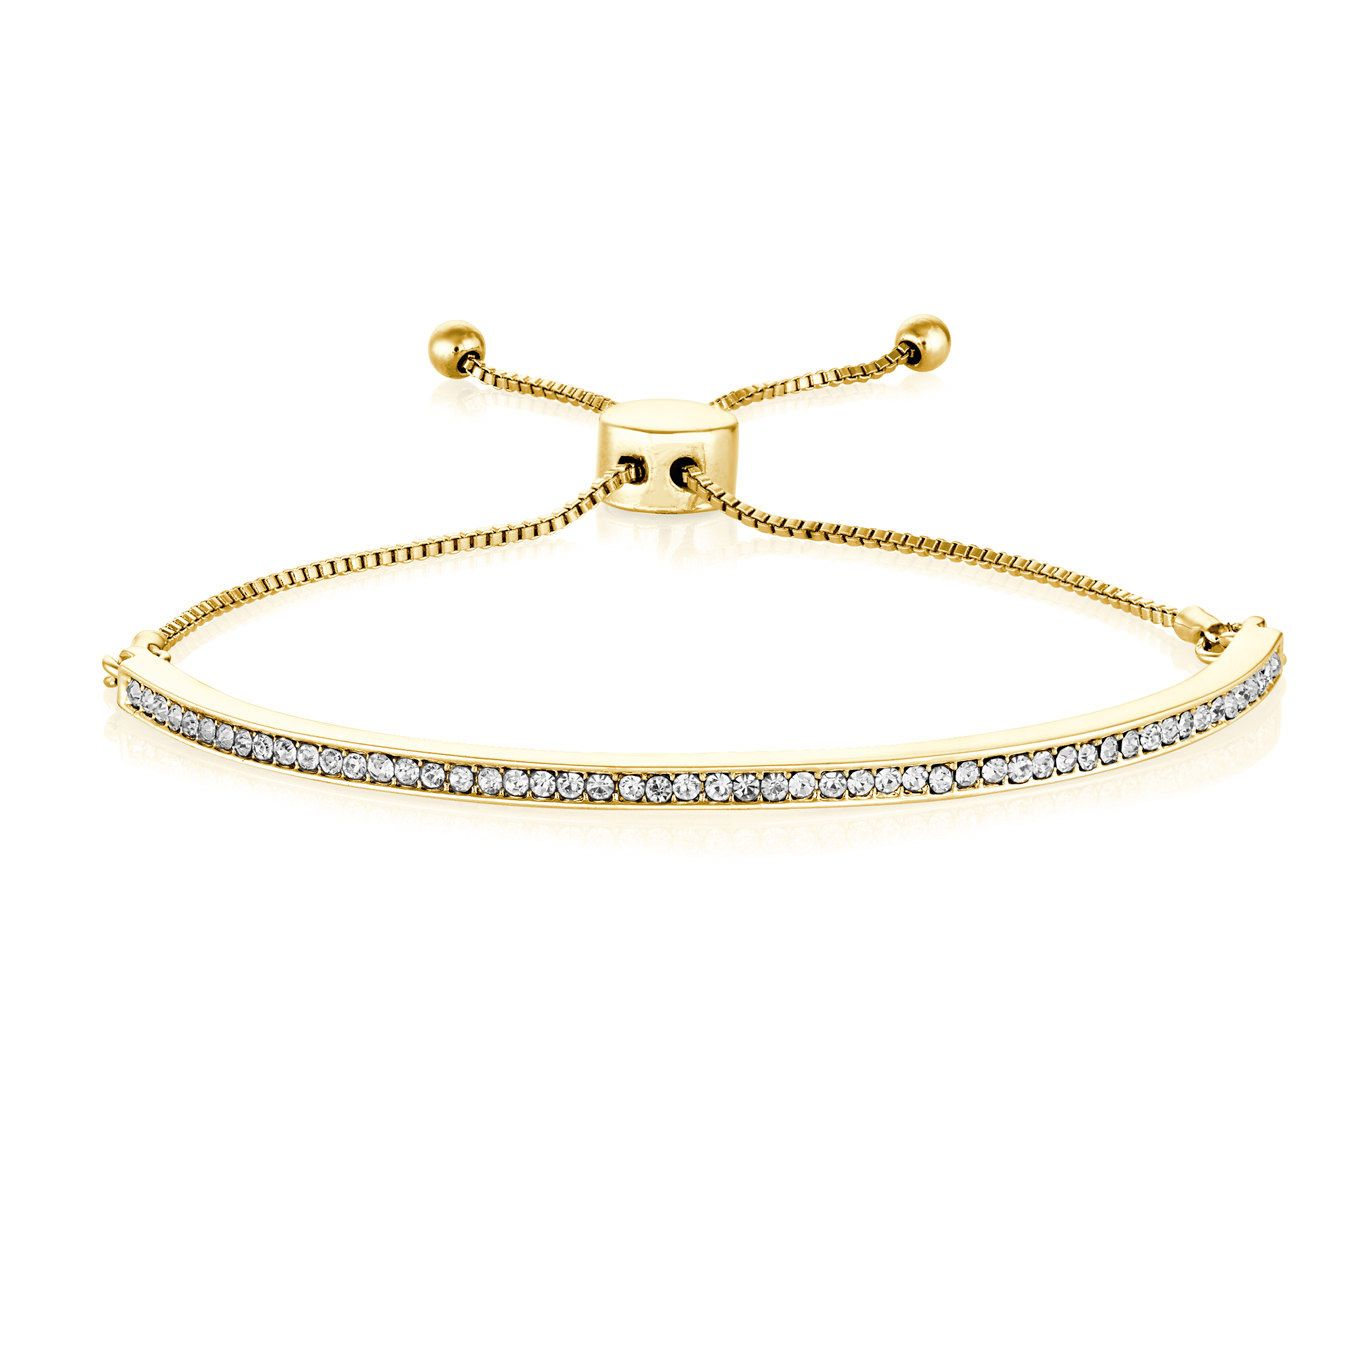 Buckley London Portobello Bracelet - Gold